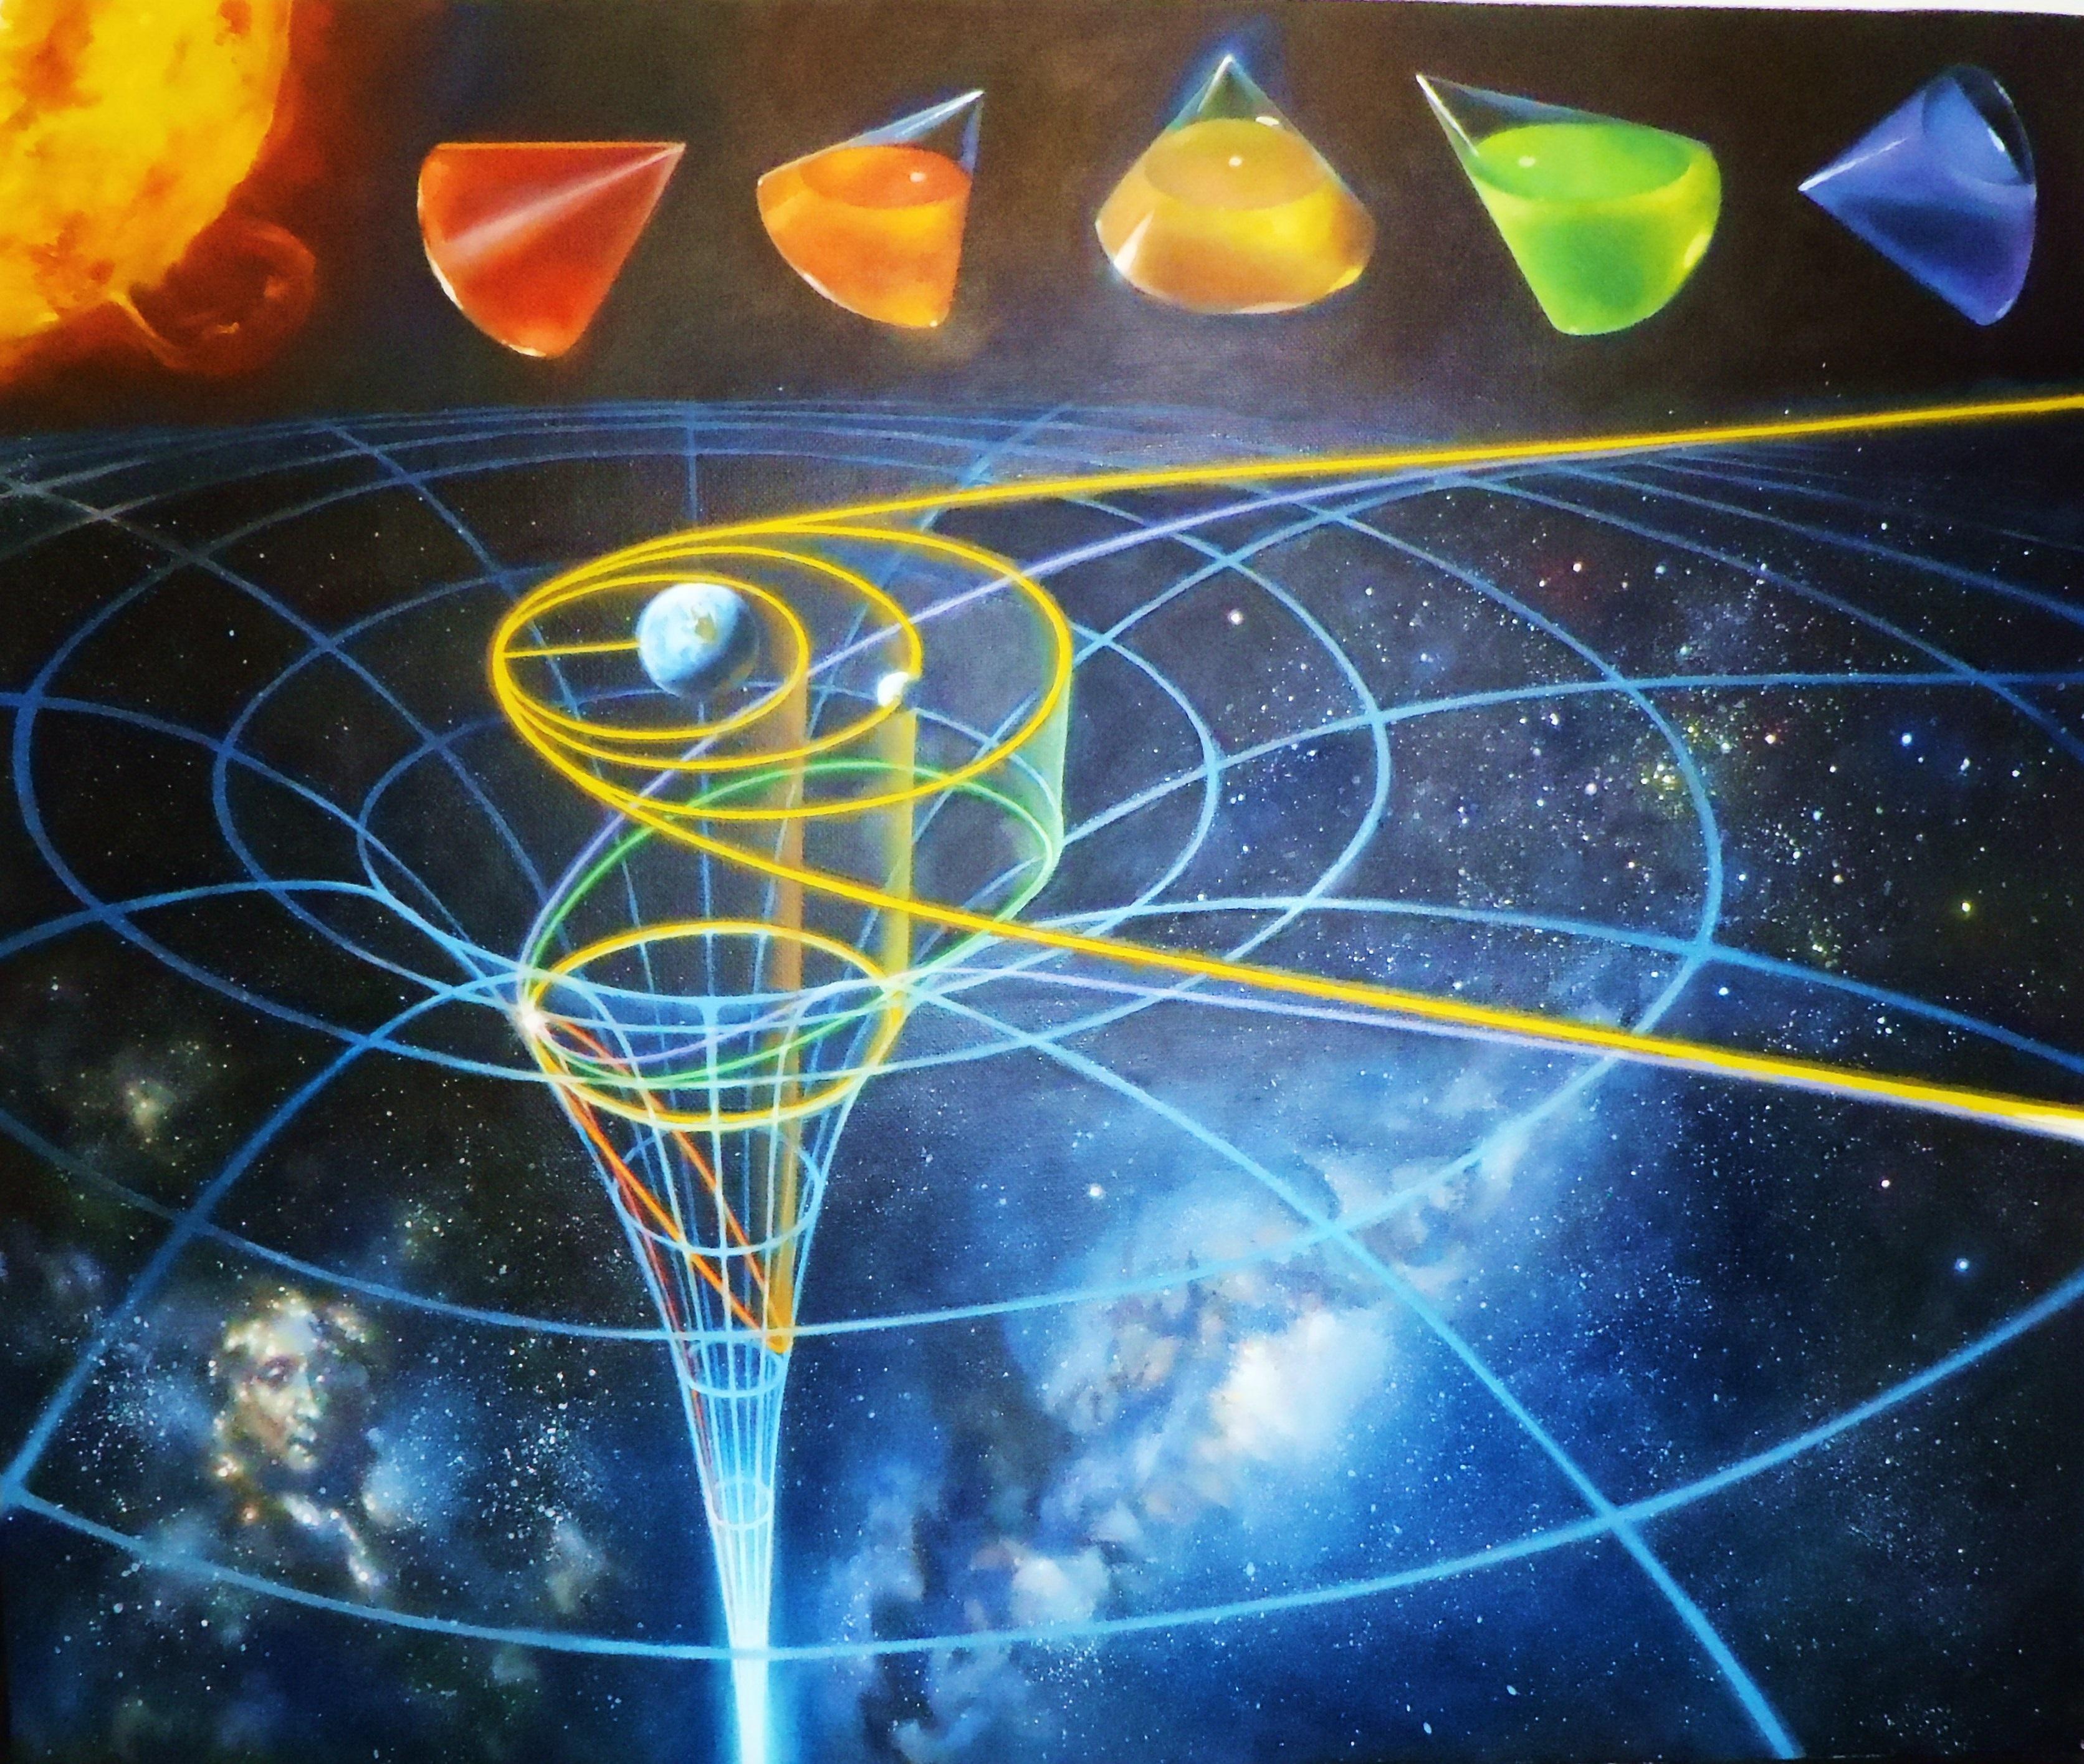 What Is Creation Bhavanajagat